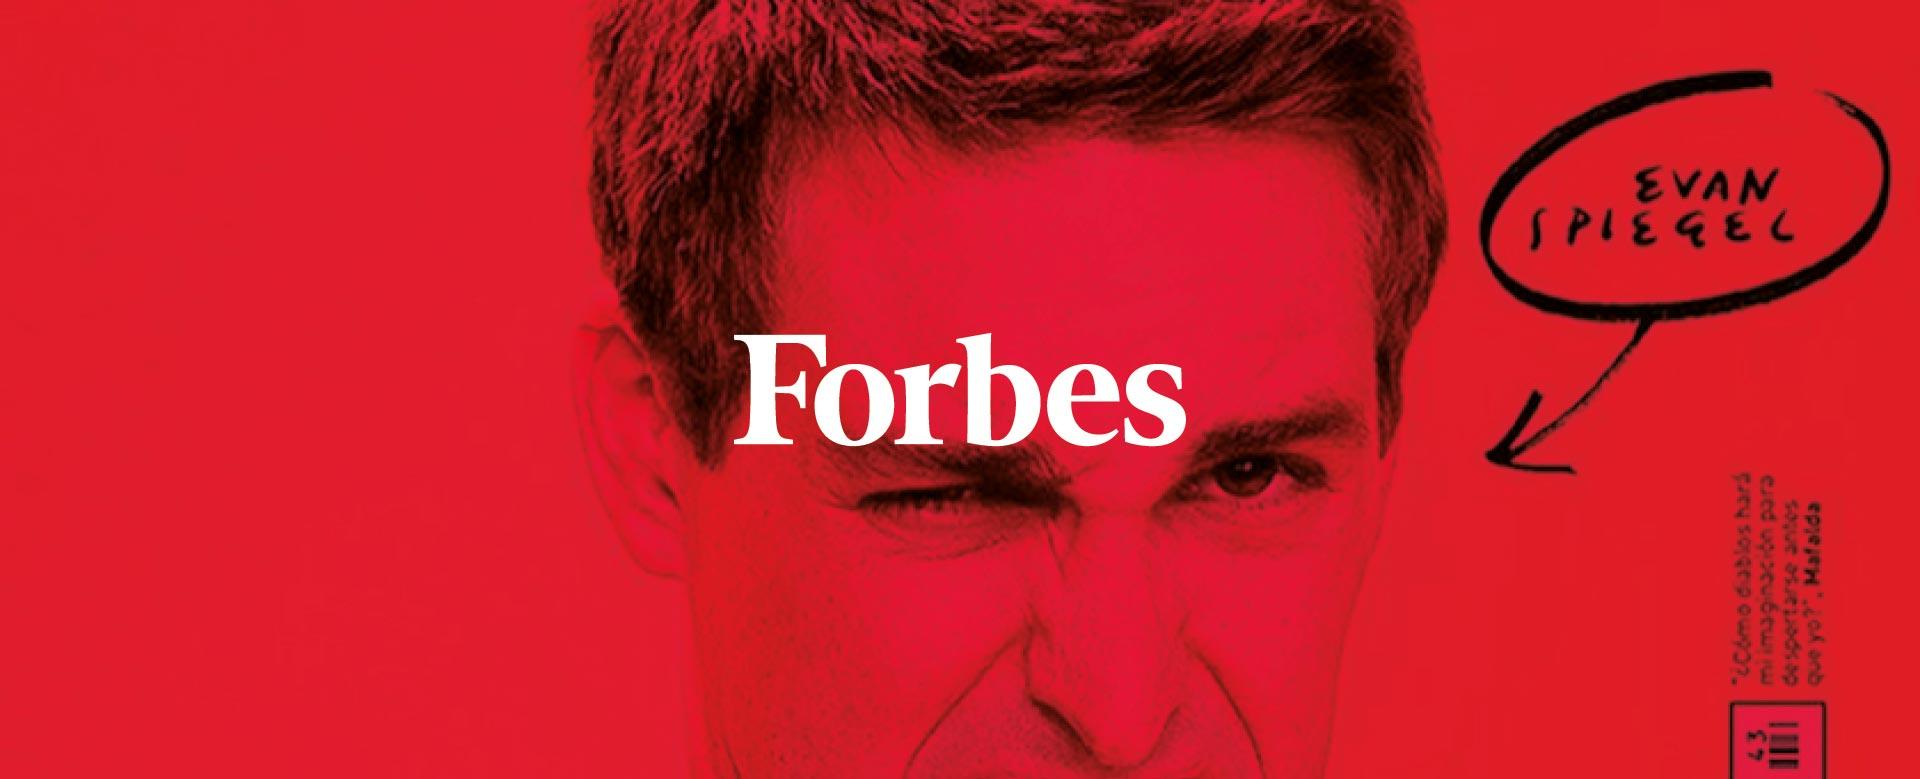 Forbes Spagna Bg